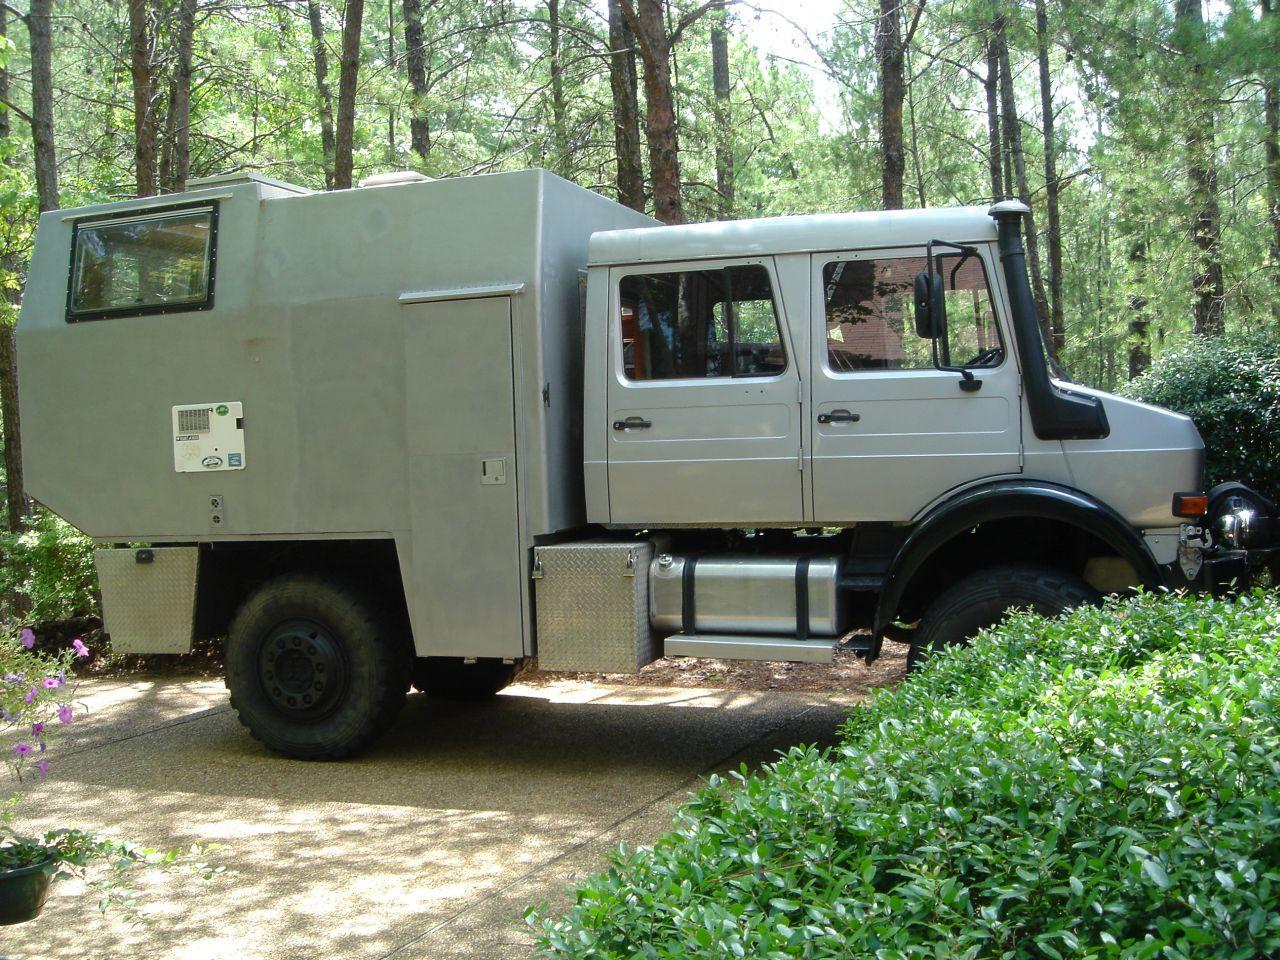 Overland Unimog Doka 4x4 Camper Unimog Overland Truck